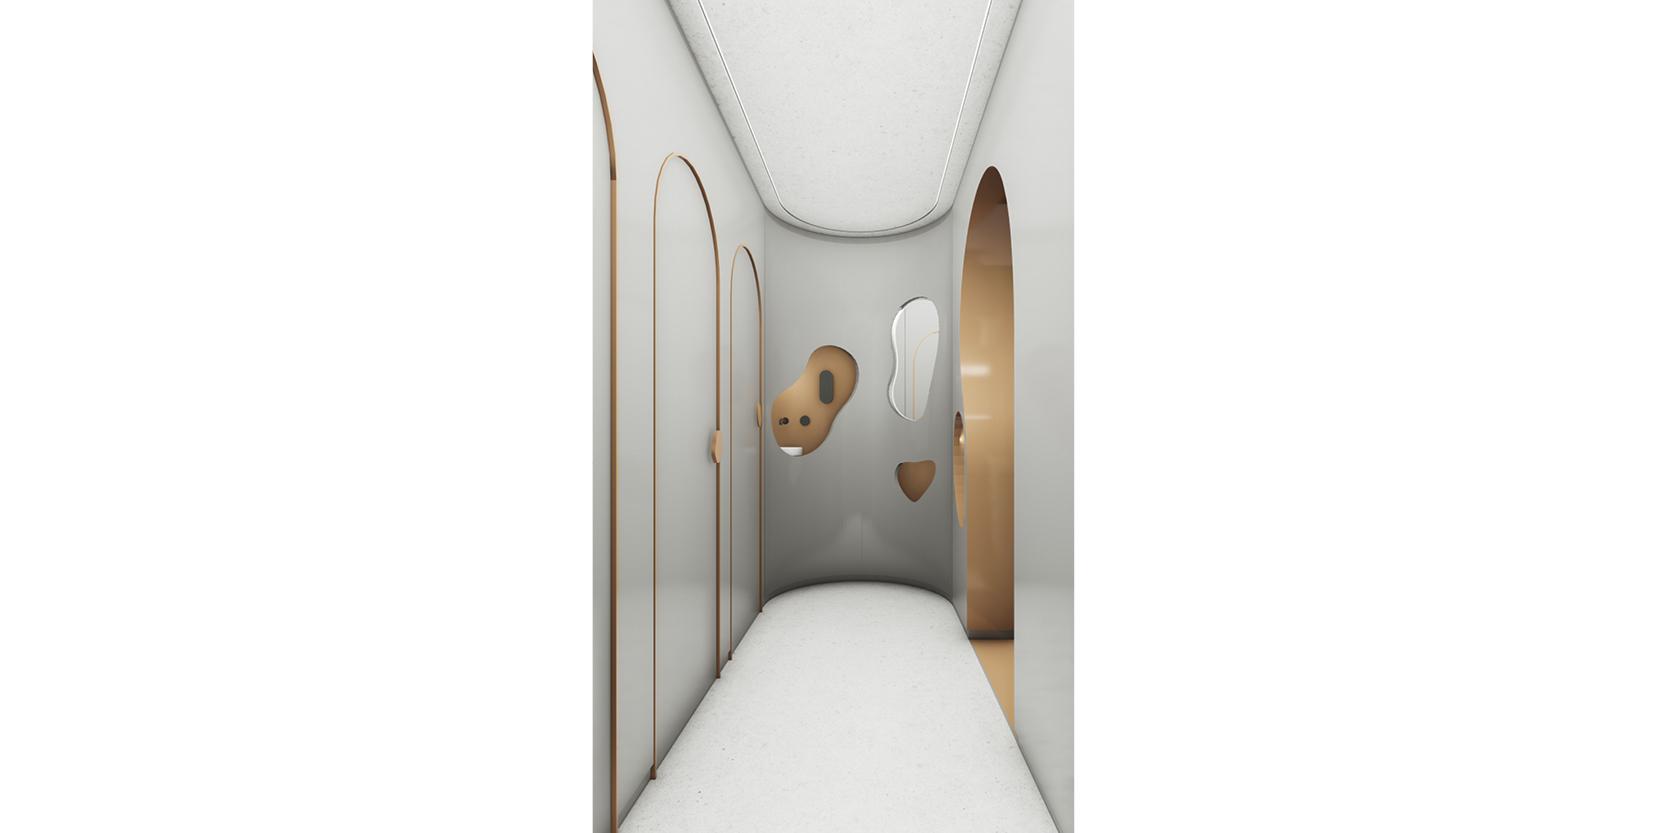 Reforma lavabos estadistica IDESCAT OCA Architects Arquitectura architecture interior design disseny interior Hernan Lleida Bernardo Garcia